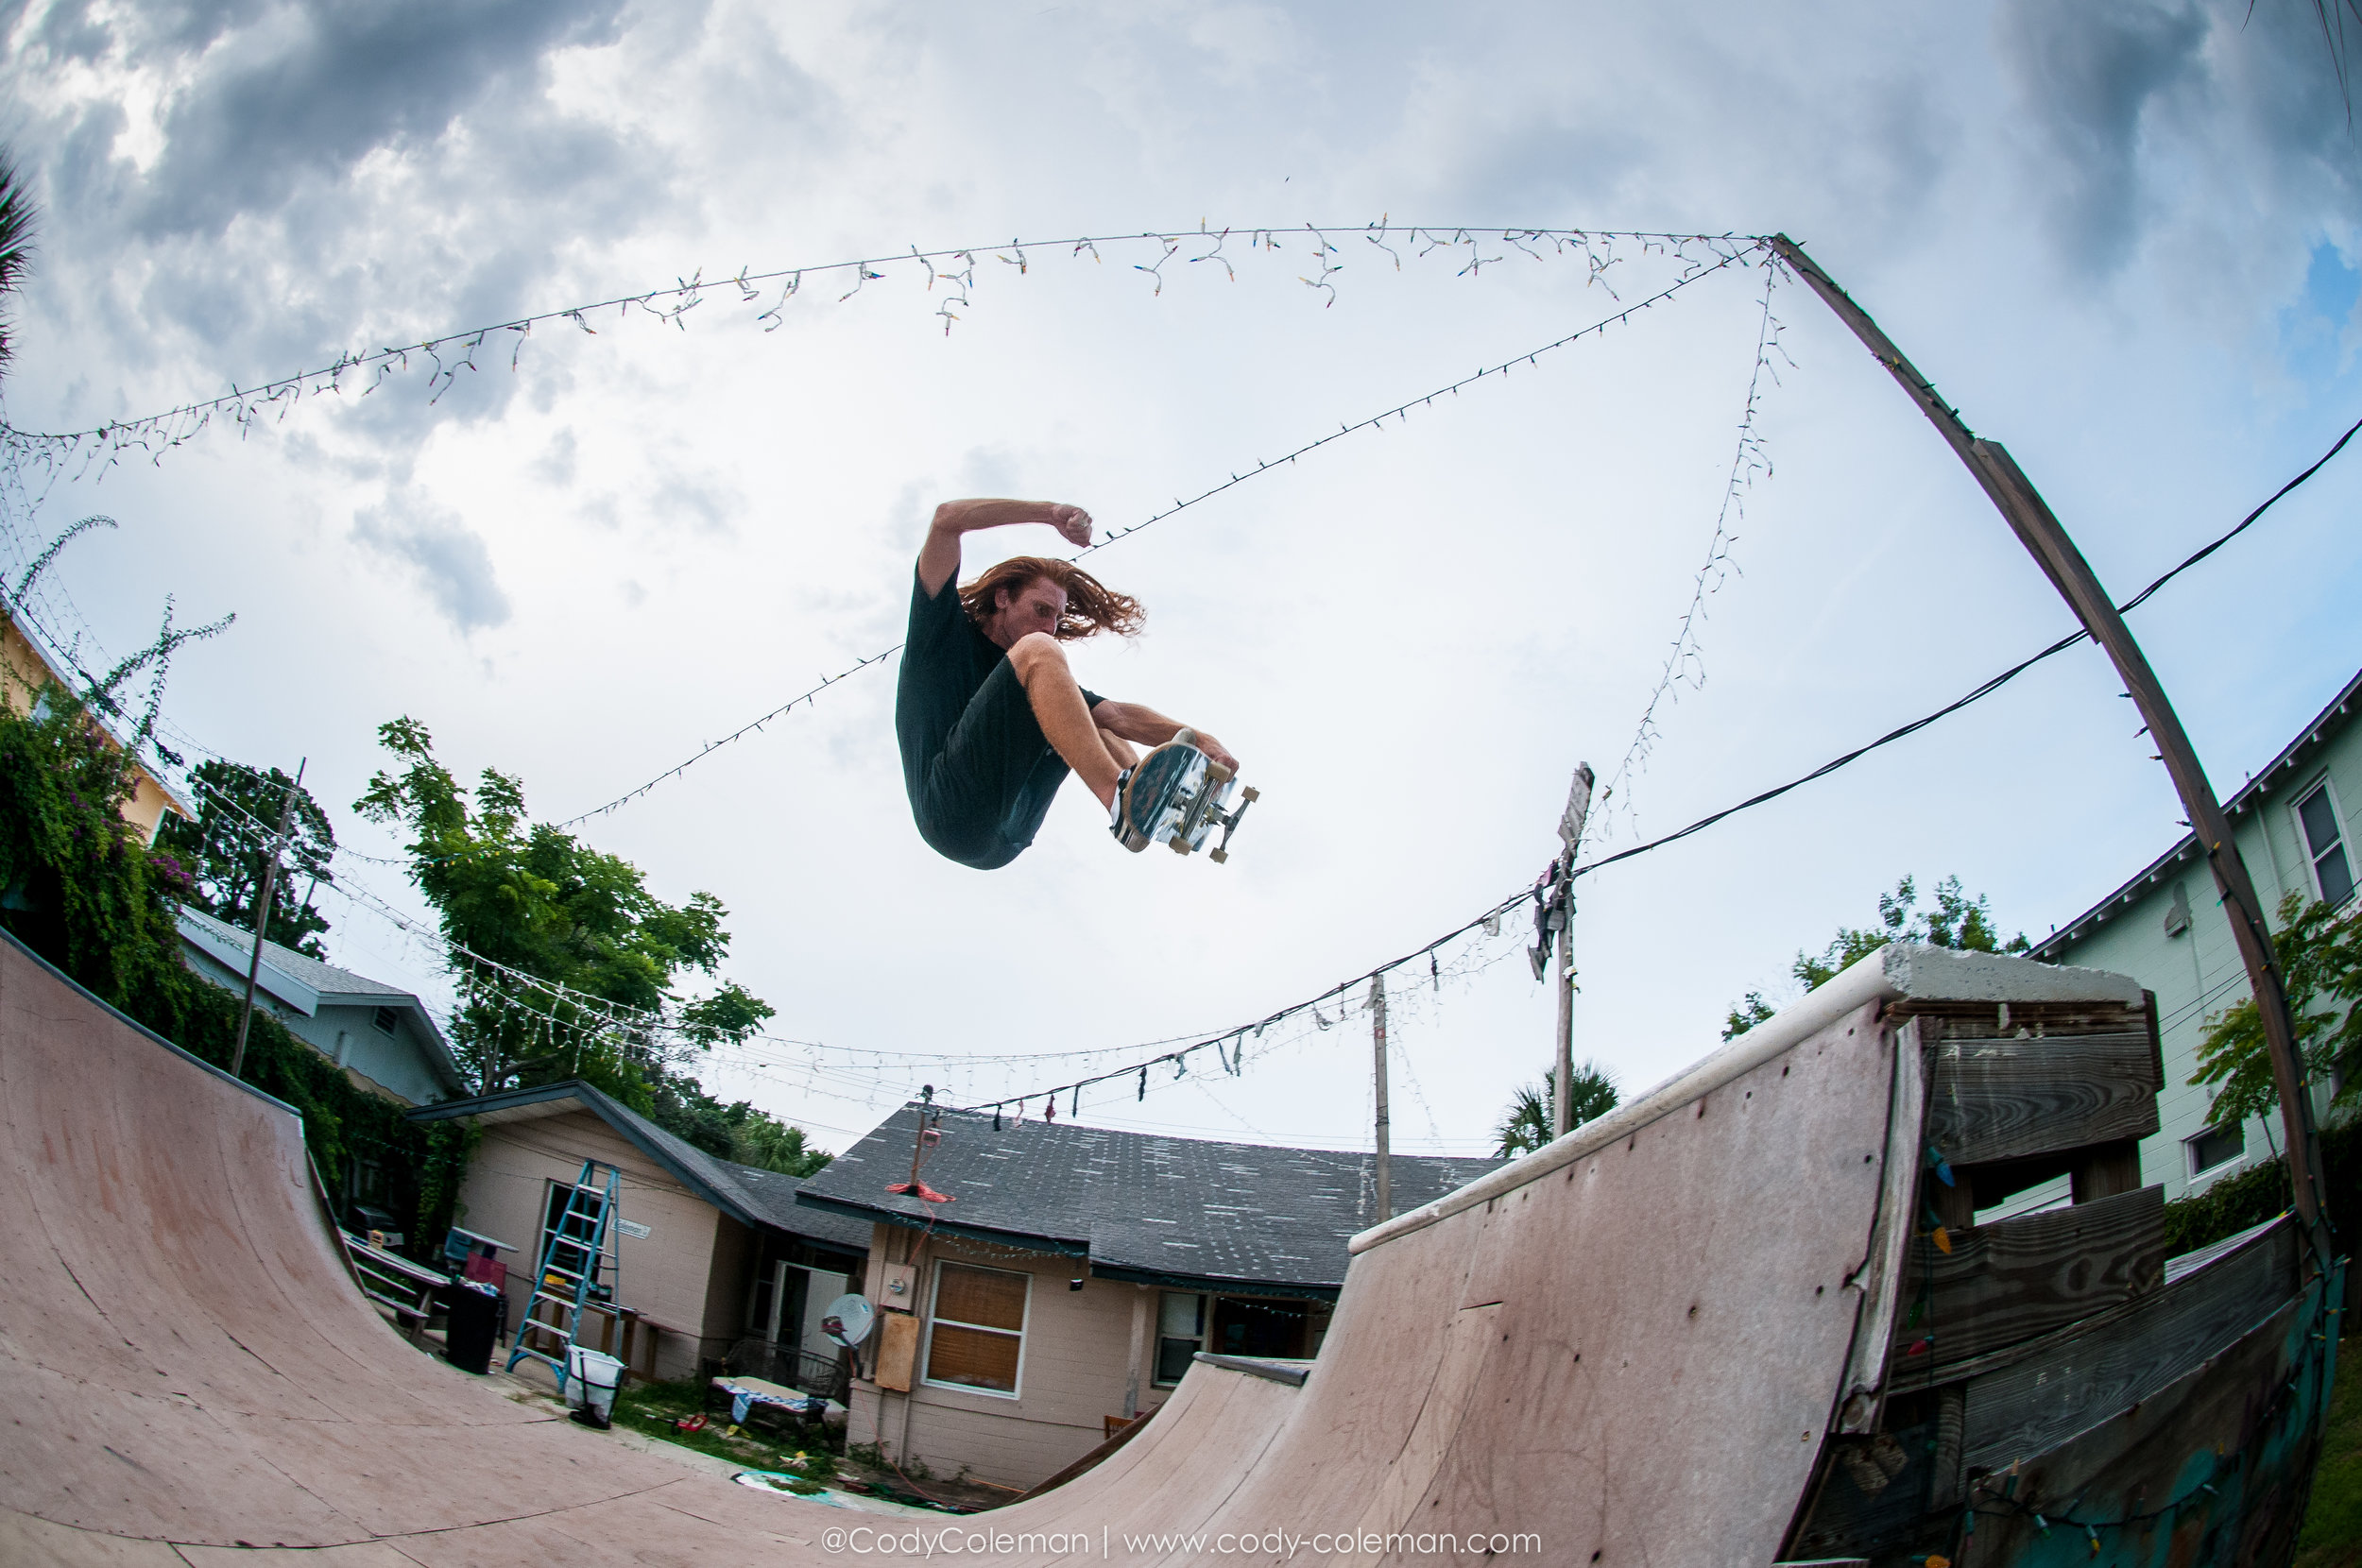 BackyardBozos_Photo_Coleman-9.jpg